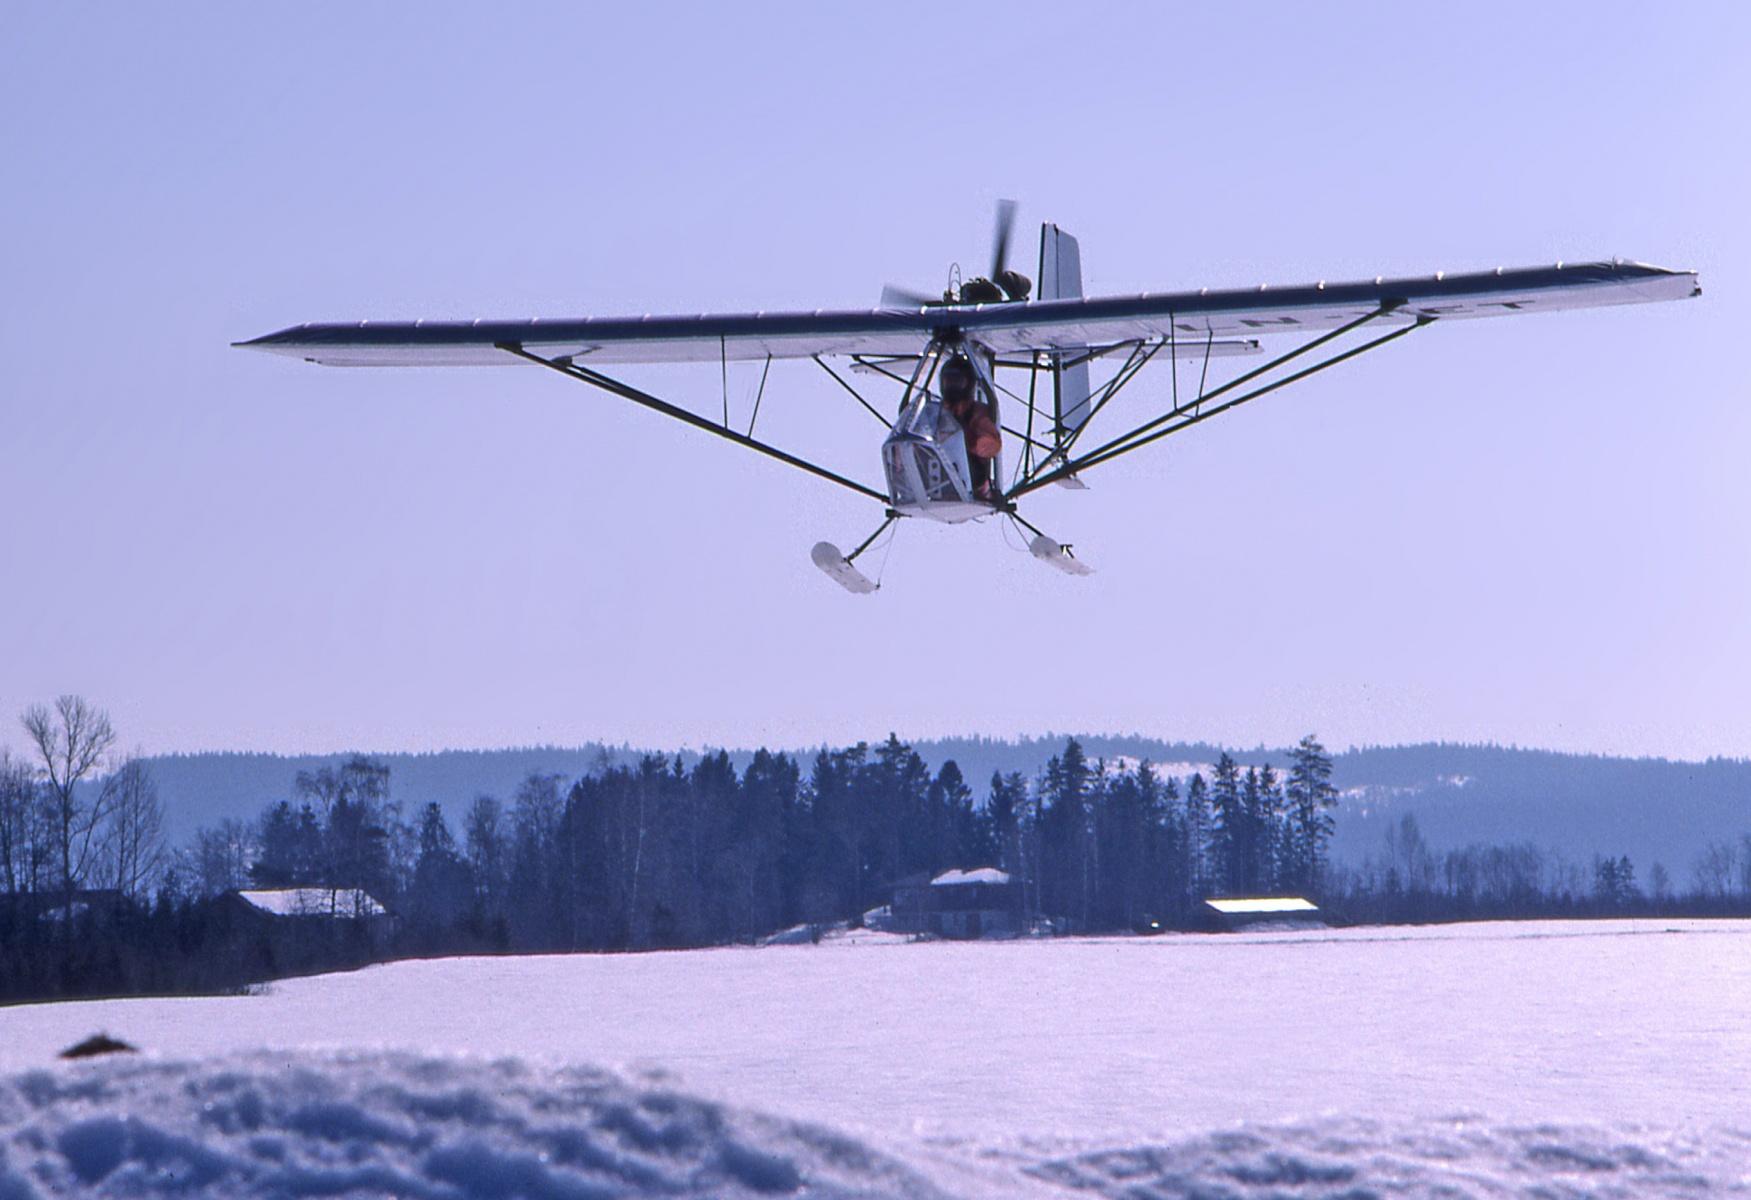 mh_34_tierra_ski_landing